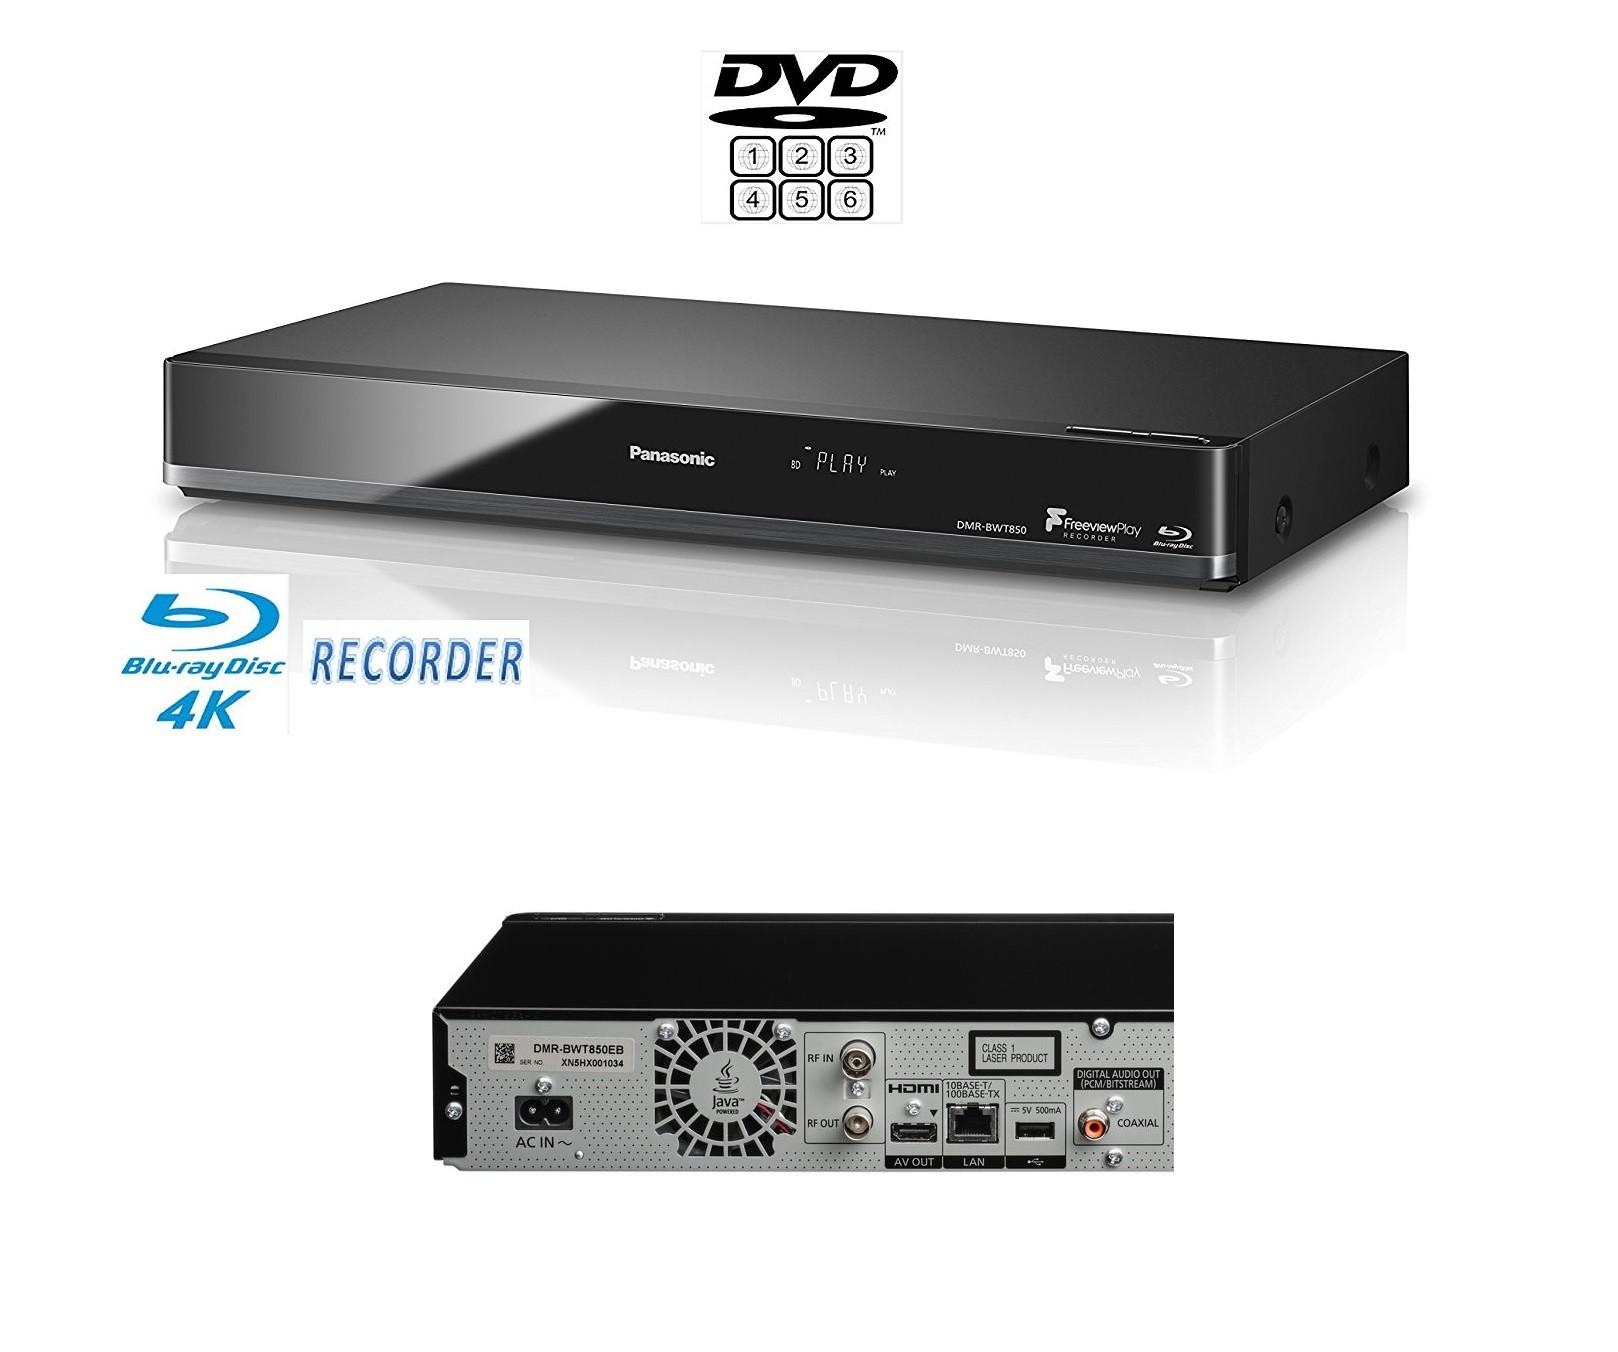 panasonic multiregion dmr bwt850 3d 4k smart blu ray hd recorder 1tb hdd wifi 784672480840 ebay. Black Bedroom Furniture Sets. Home Design Ideas